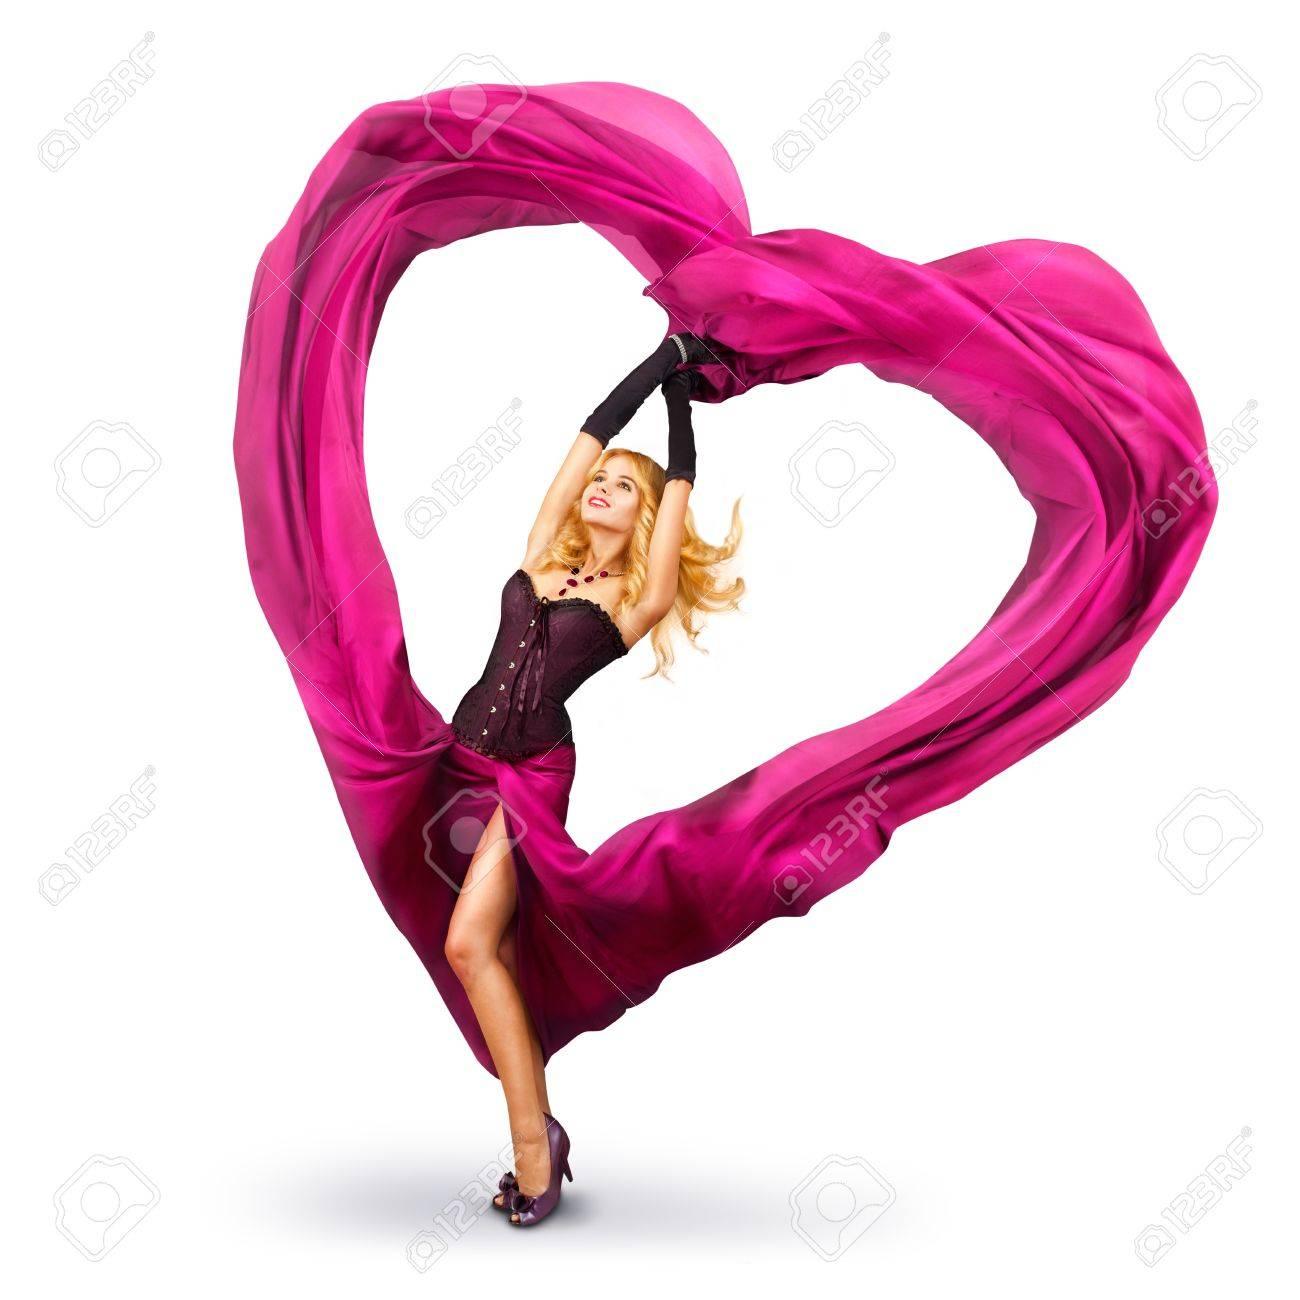 Sexy Beautiful Woman Dancing With Waving Fabric Stock Photo - 17501773